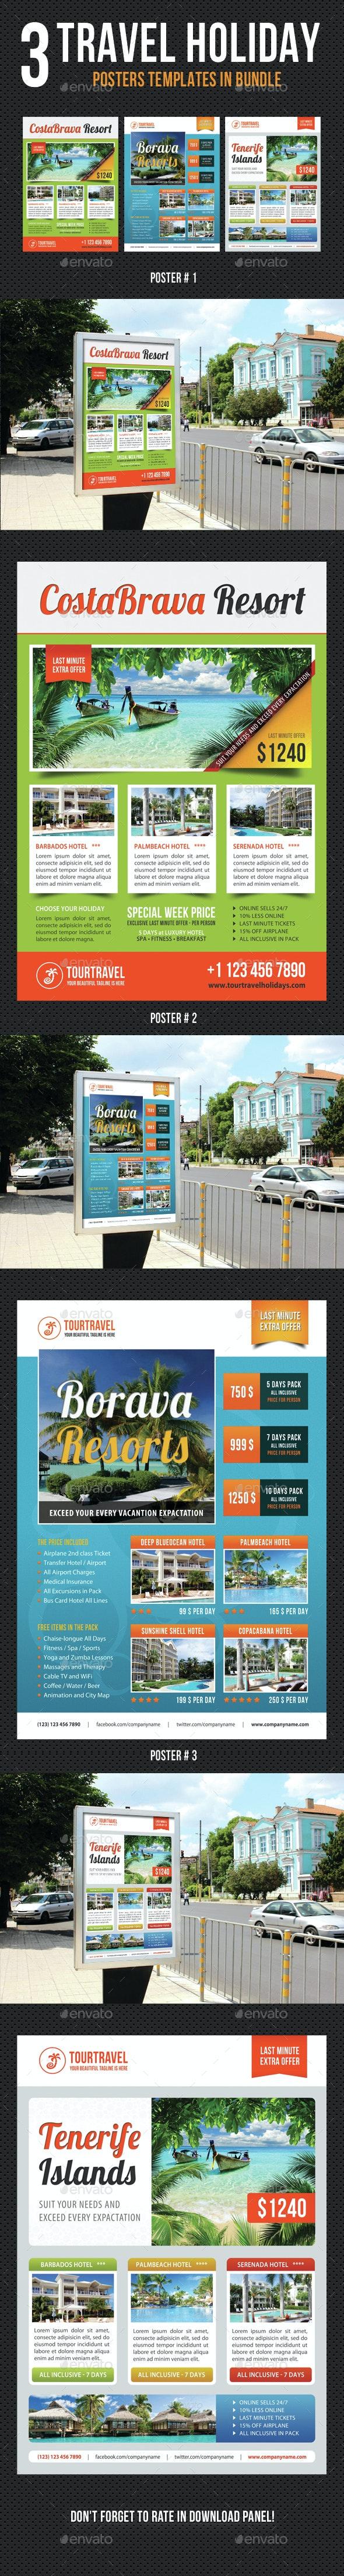 3 Travel Holiday Poster Bundle 01 - Signage Print Templates